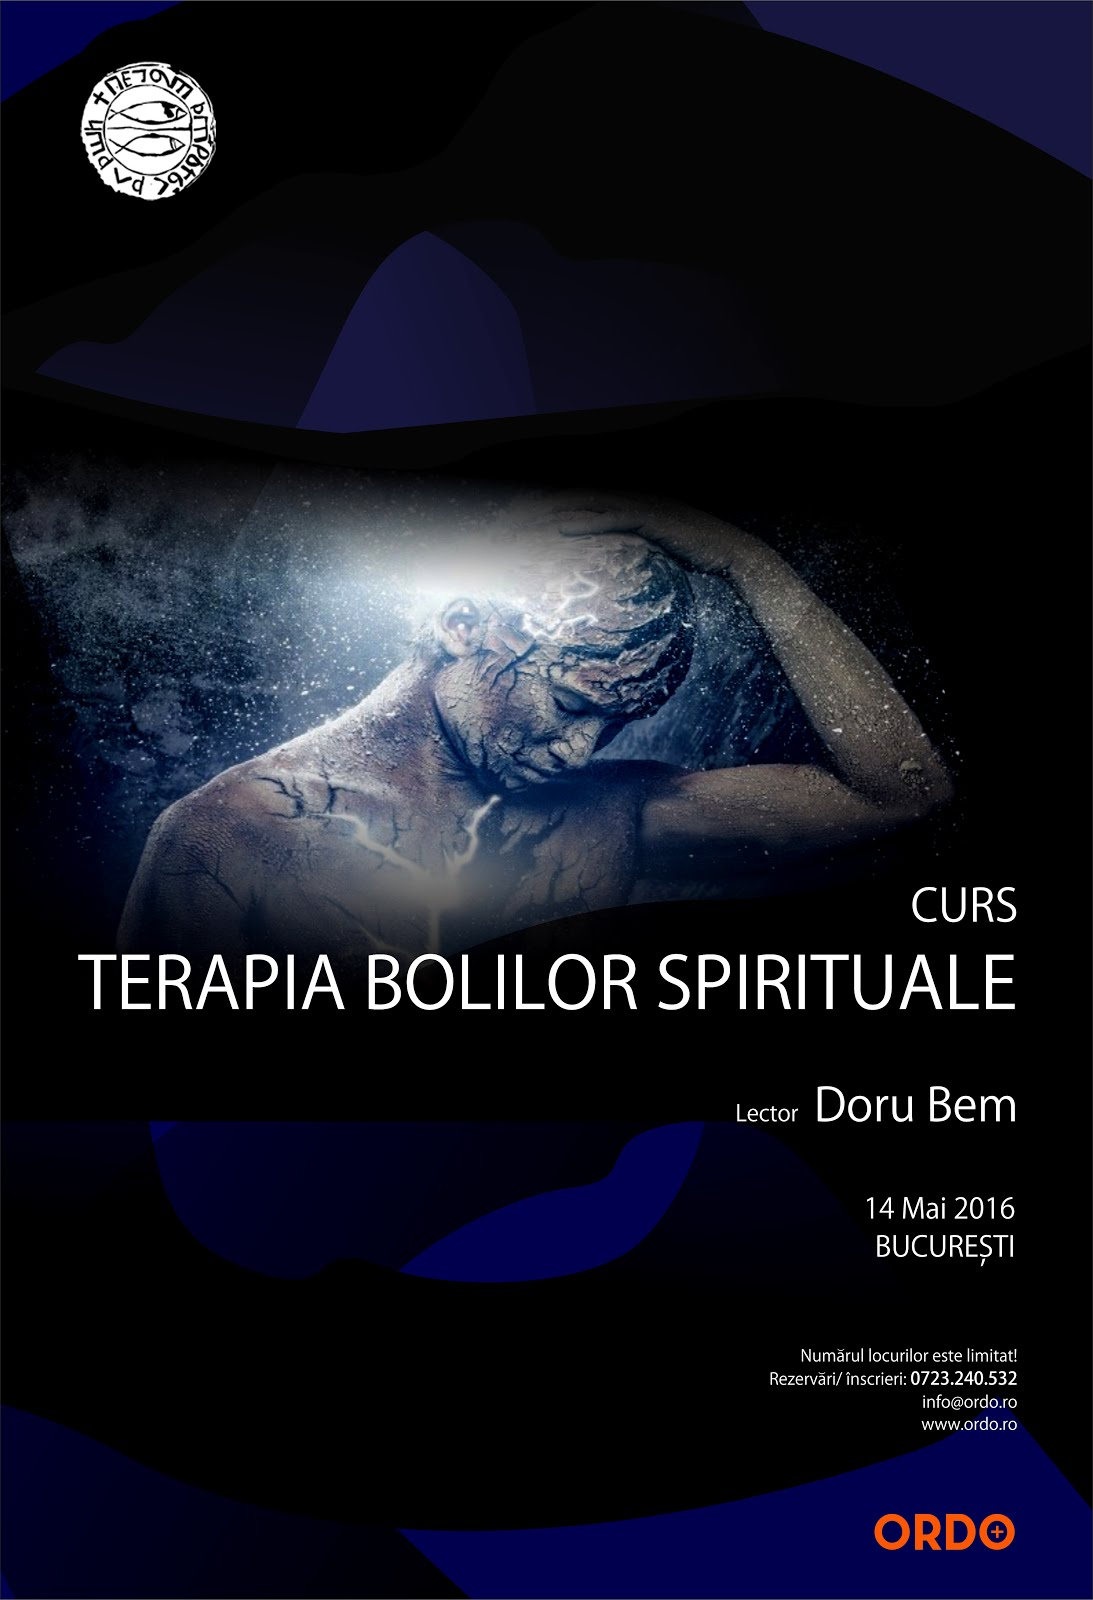 CURS INTENSIV - 14 MAI 2016 - TERAPIA BOLILOR SPIRITUALE